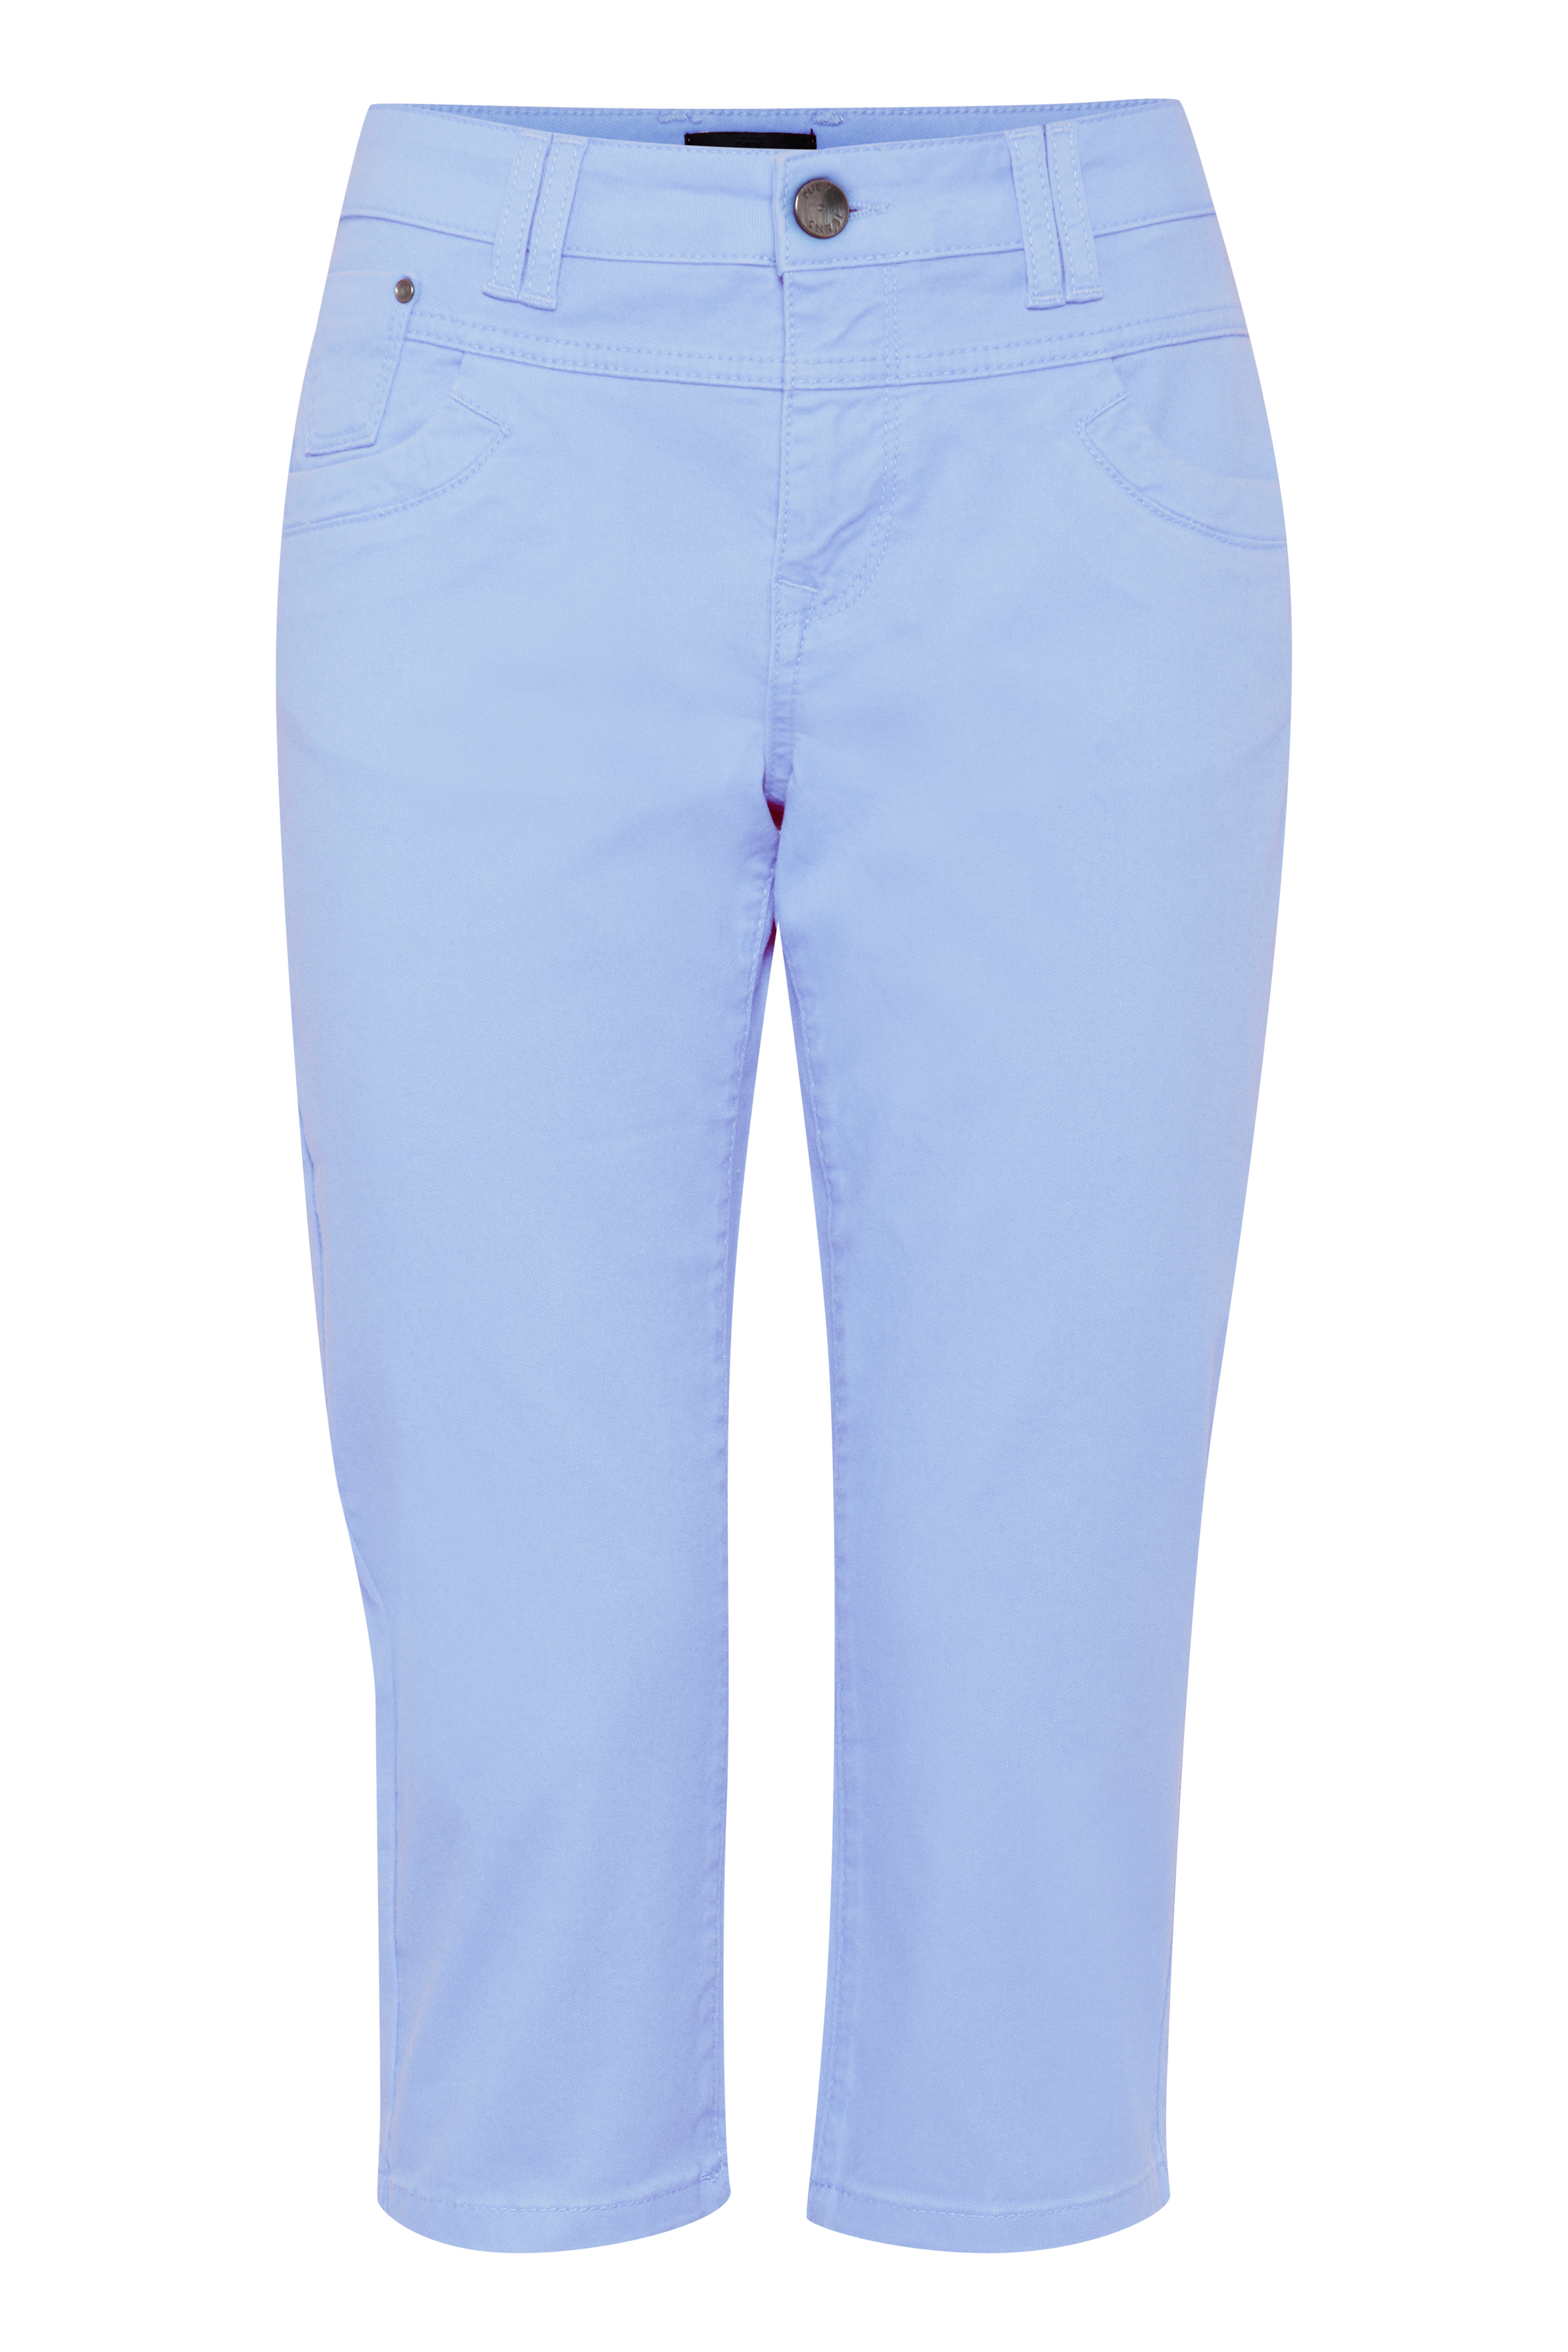 Image of Pulz Jeans Dame 5-lommet capri bukser - Lyseblå